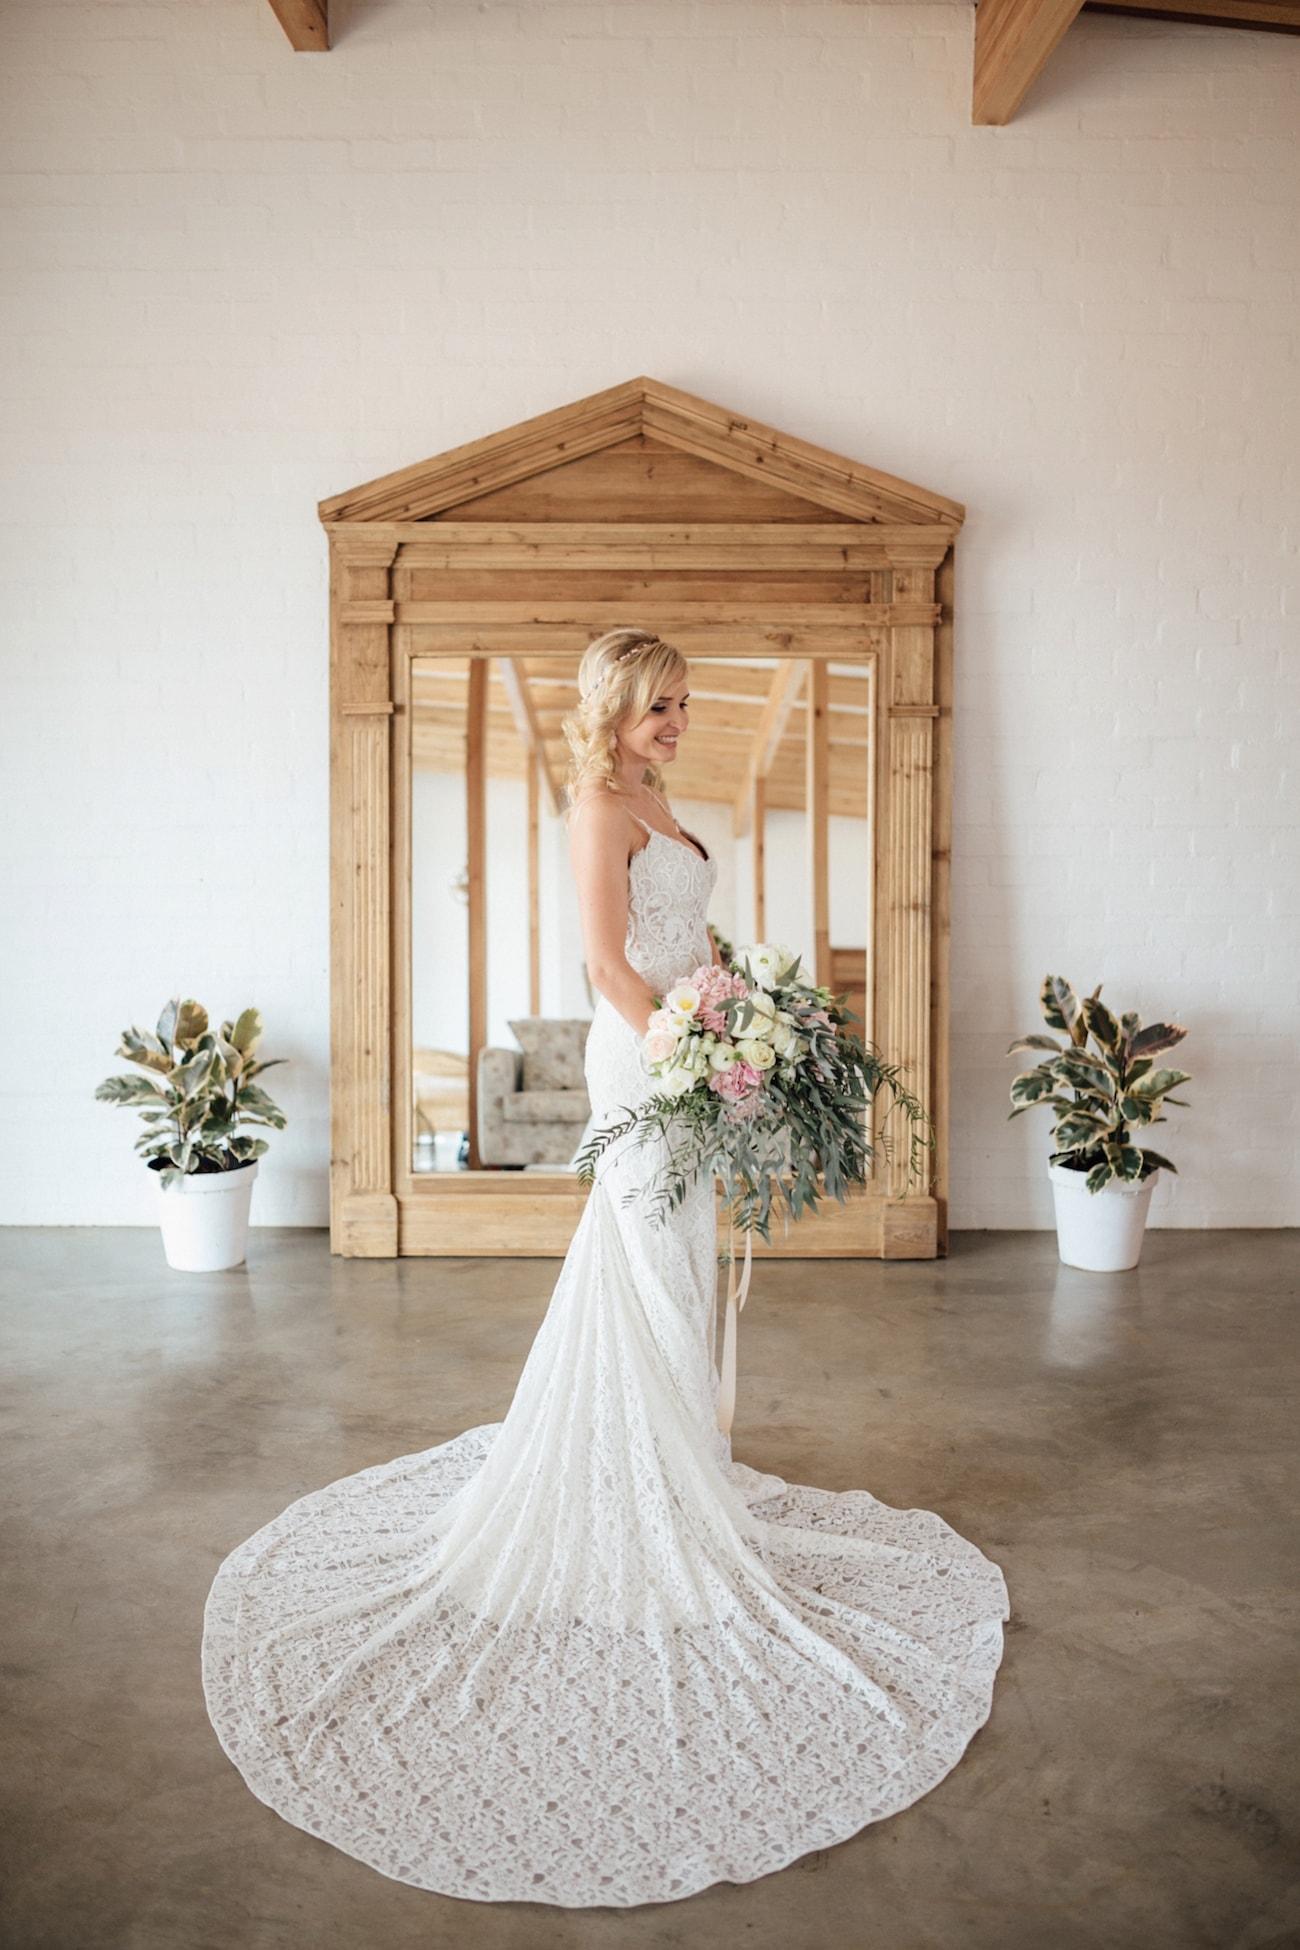 Lace Casey Jeanne Wedding Dress | Credit: Page & Holmes